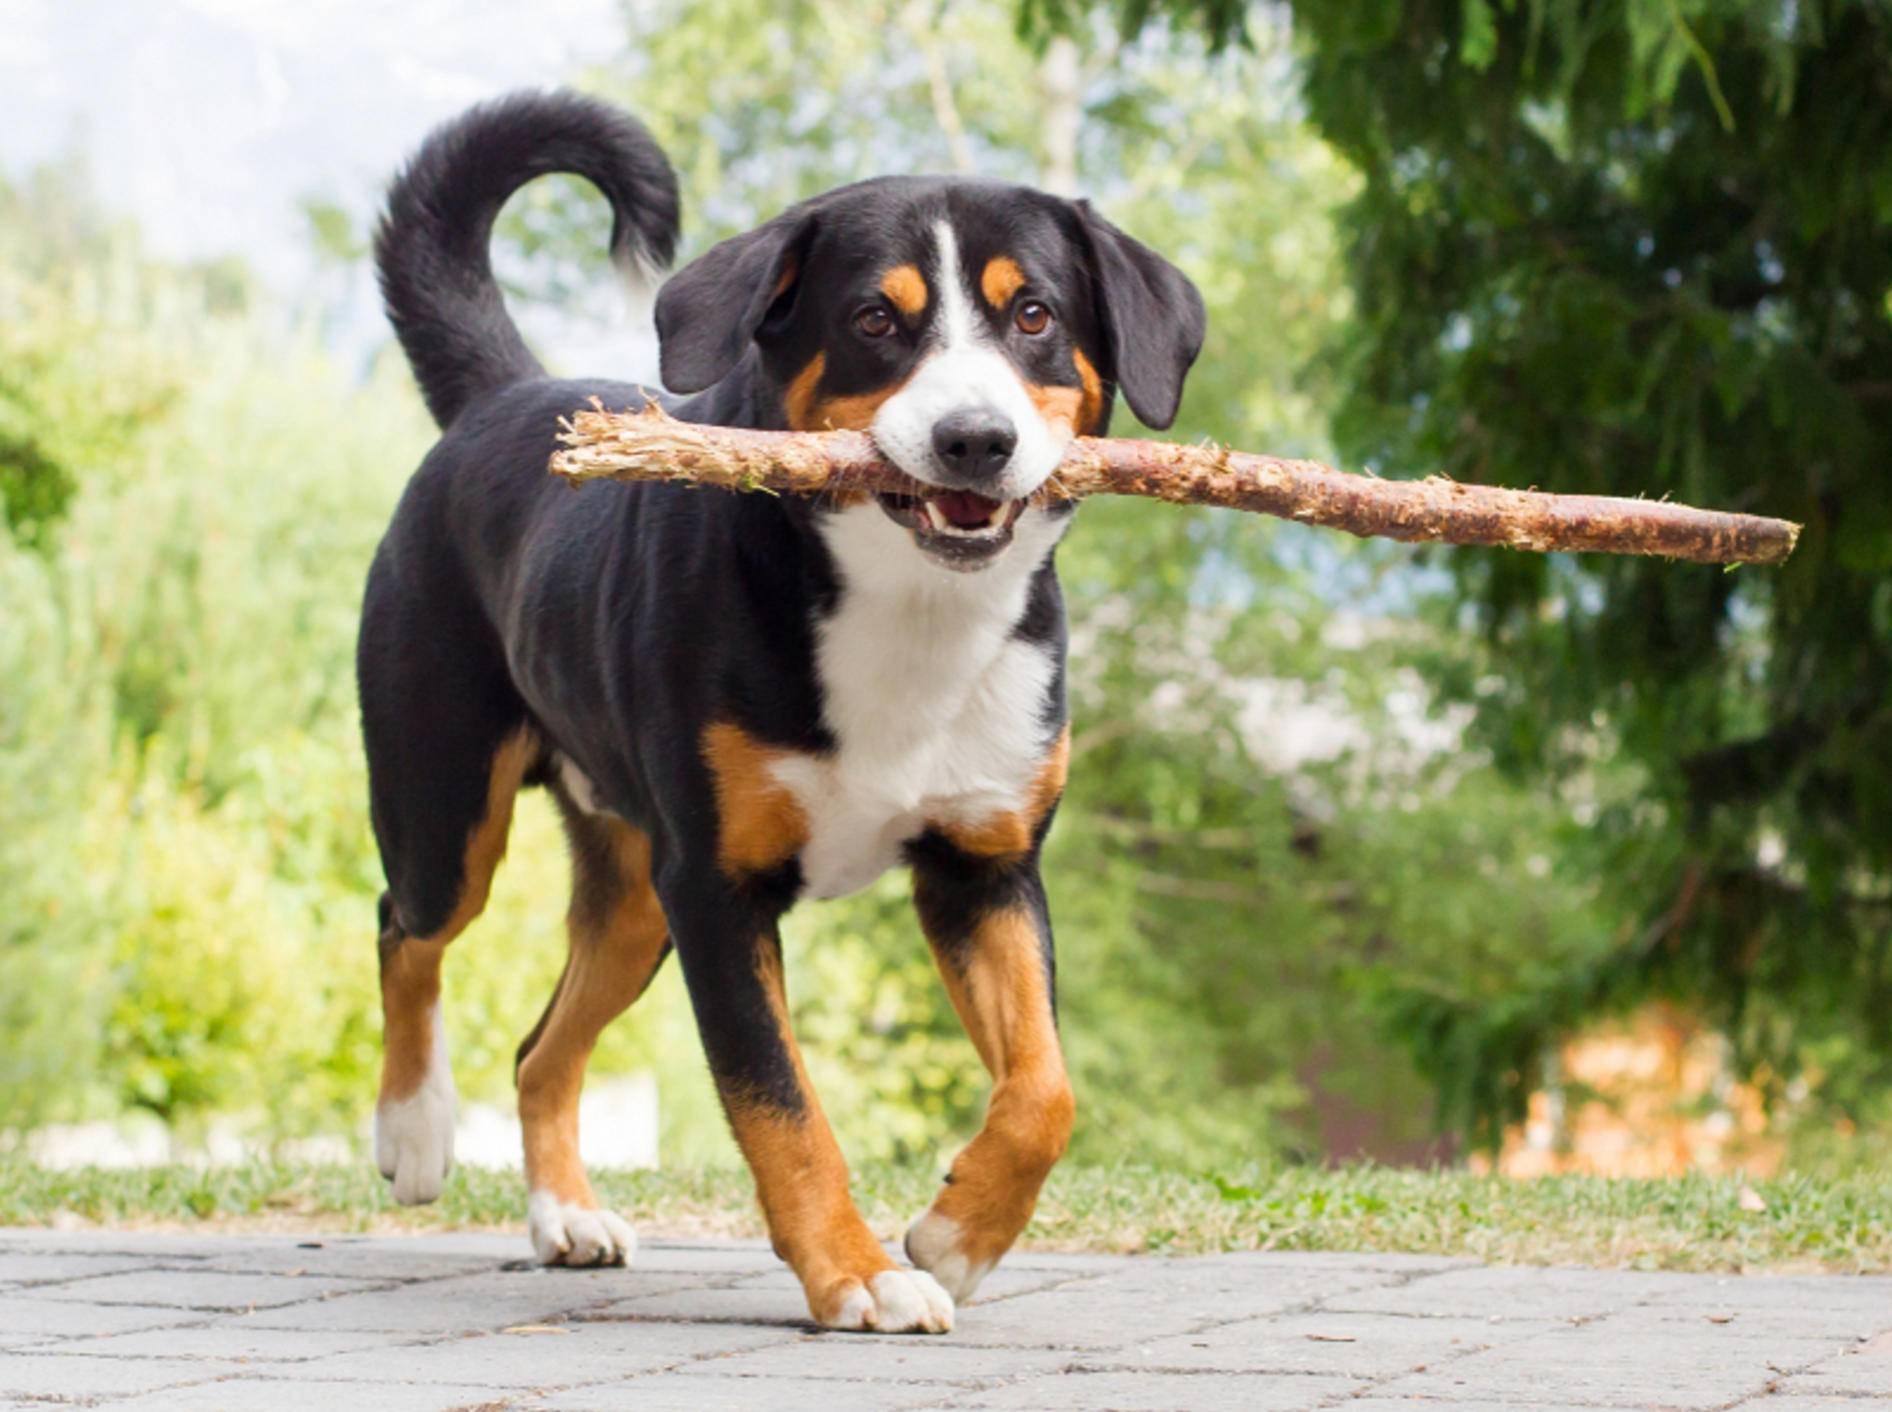 Dieser junge Appenzeller Sennenhund hat Freude am Apportieren – Shutterstock / MyImages - Micha